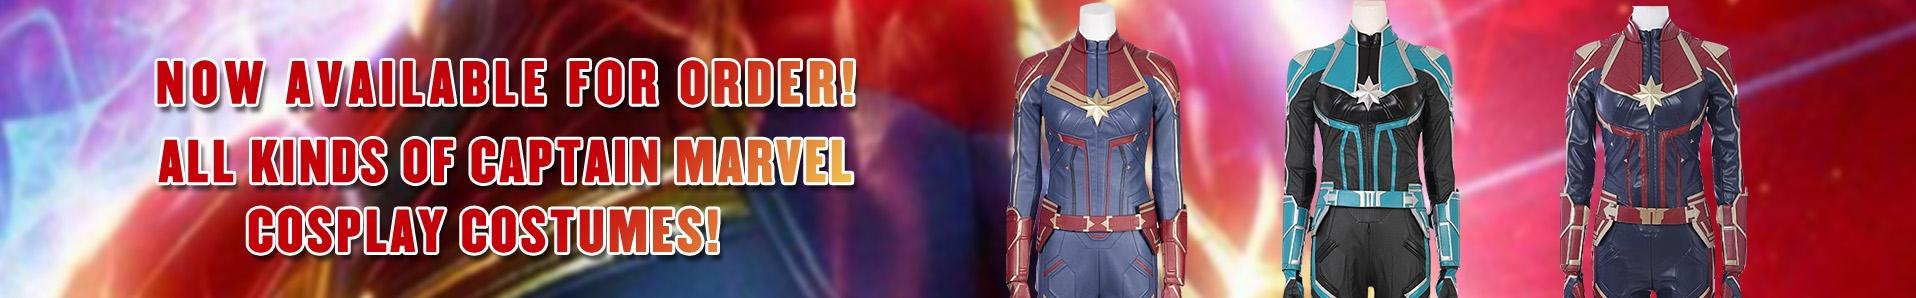 2019 captain marvel movie starforce cosplay costumes